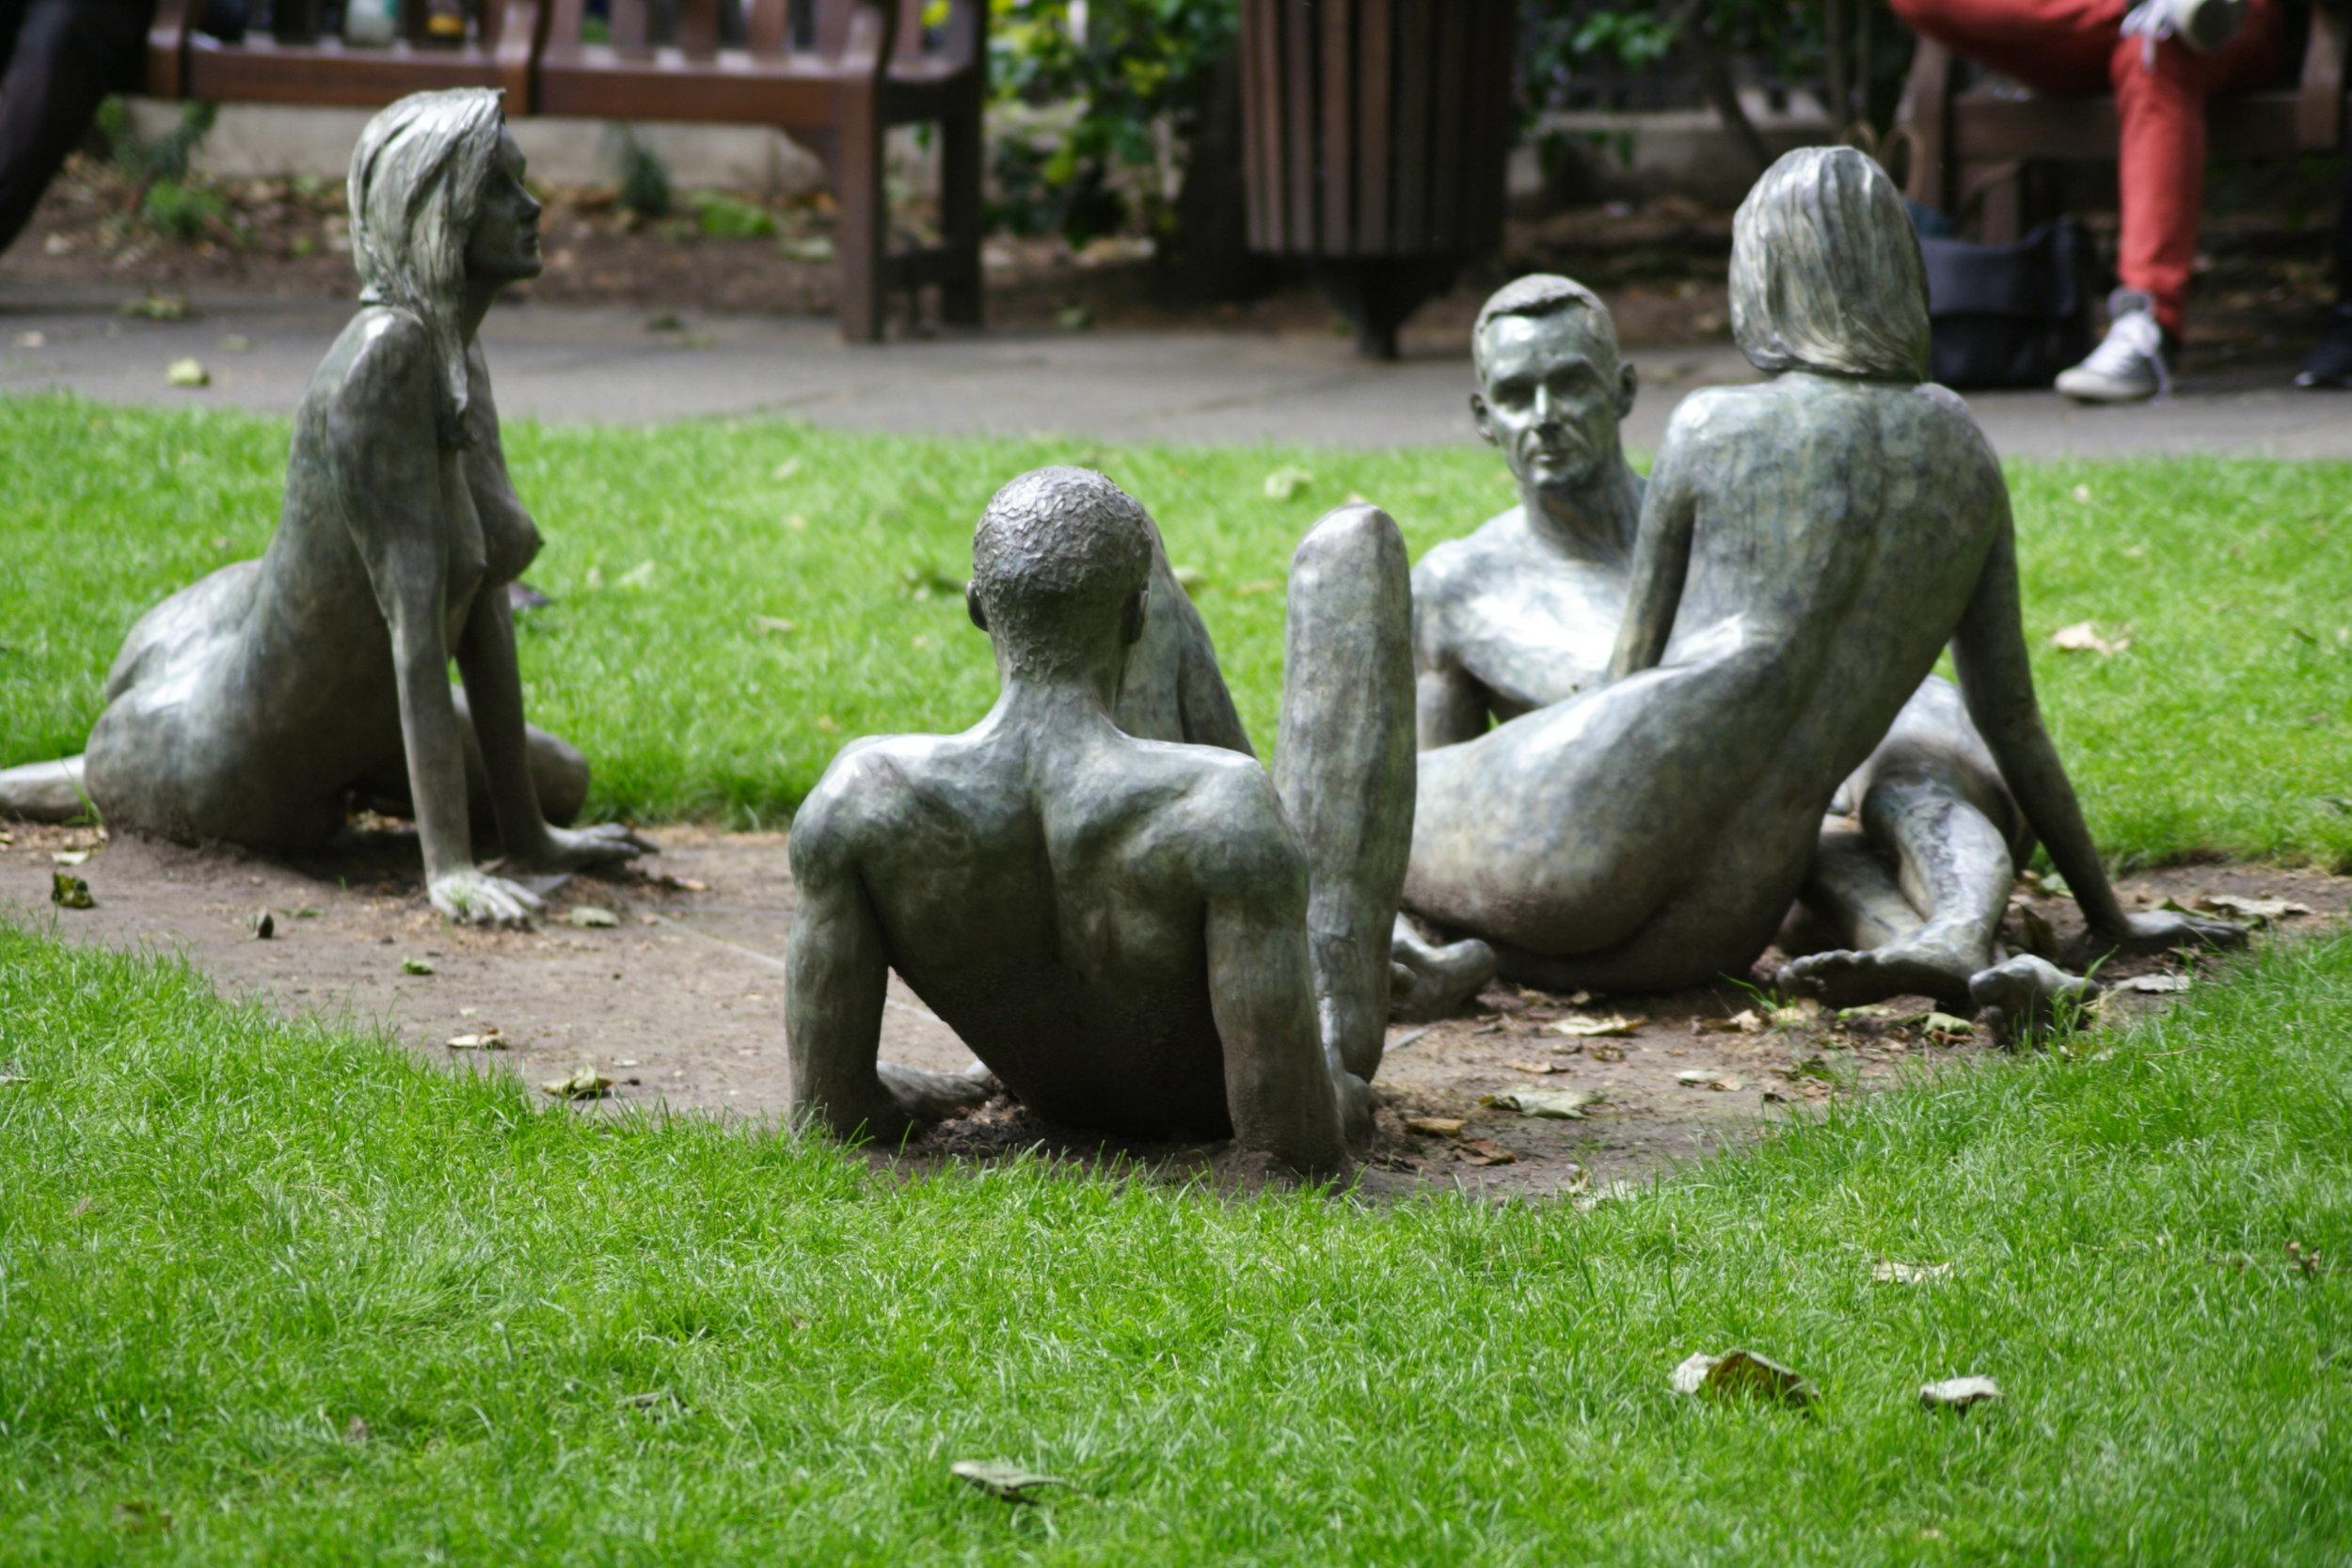 Soho Square, London, United Kingdom